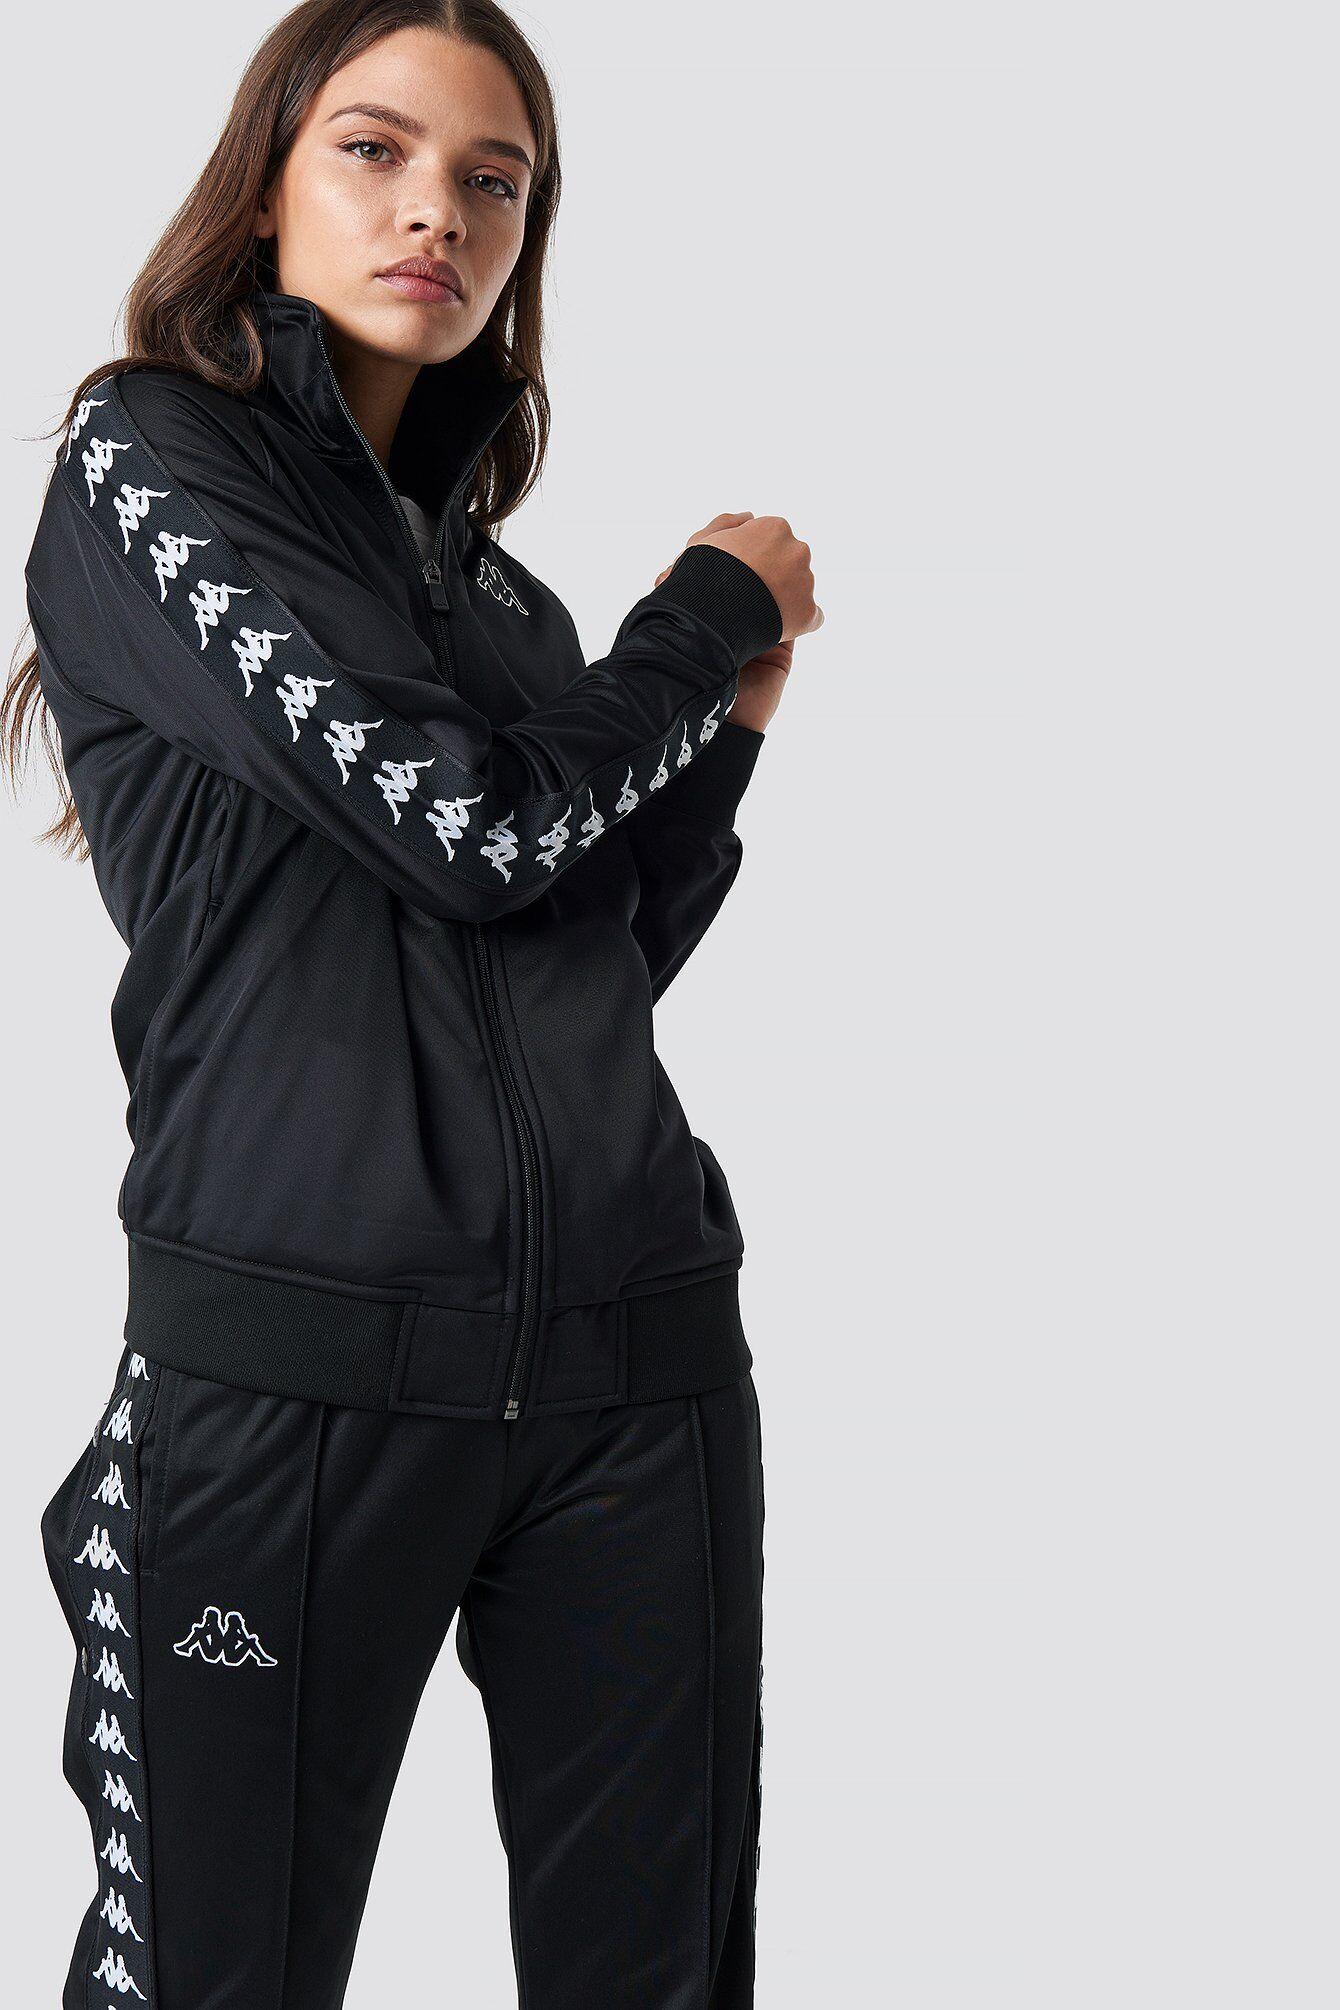 Kappa Anniston Track Jacket - Black  - Size: Small